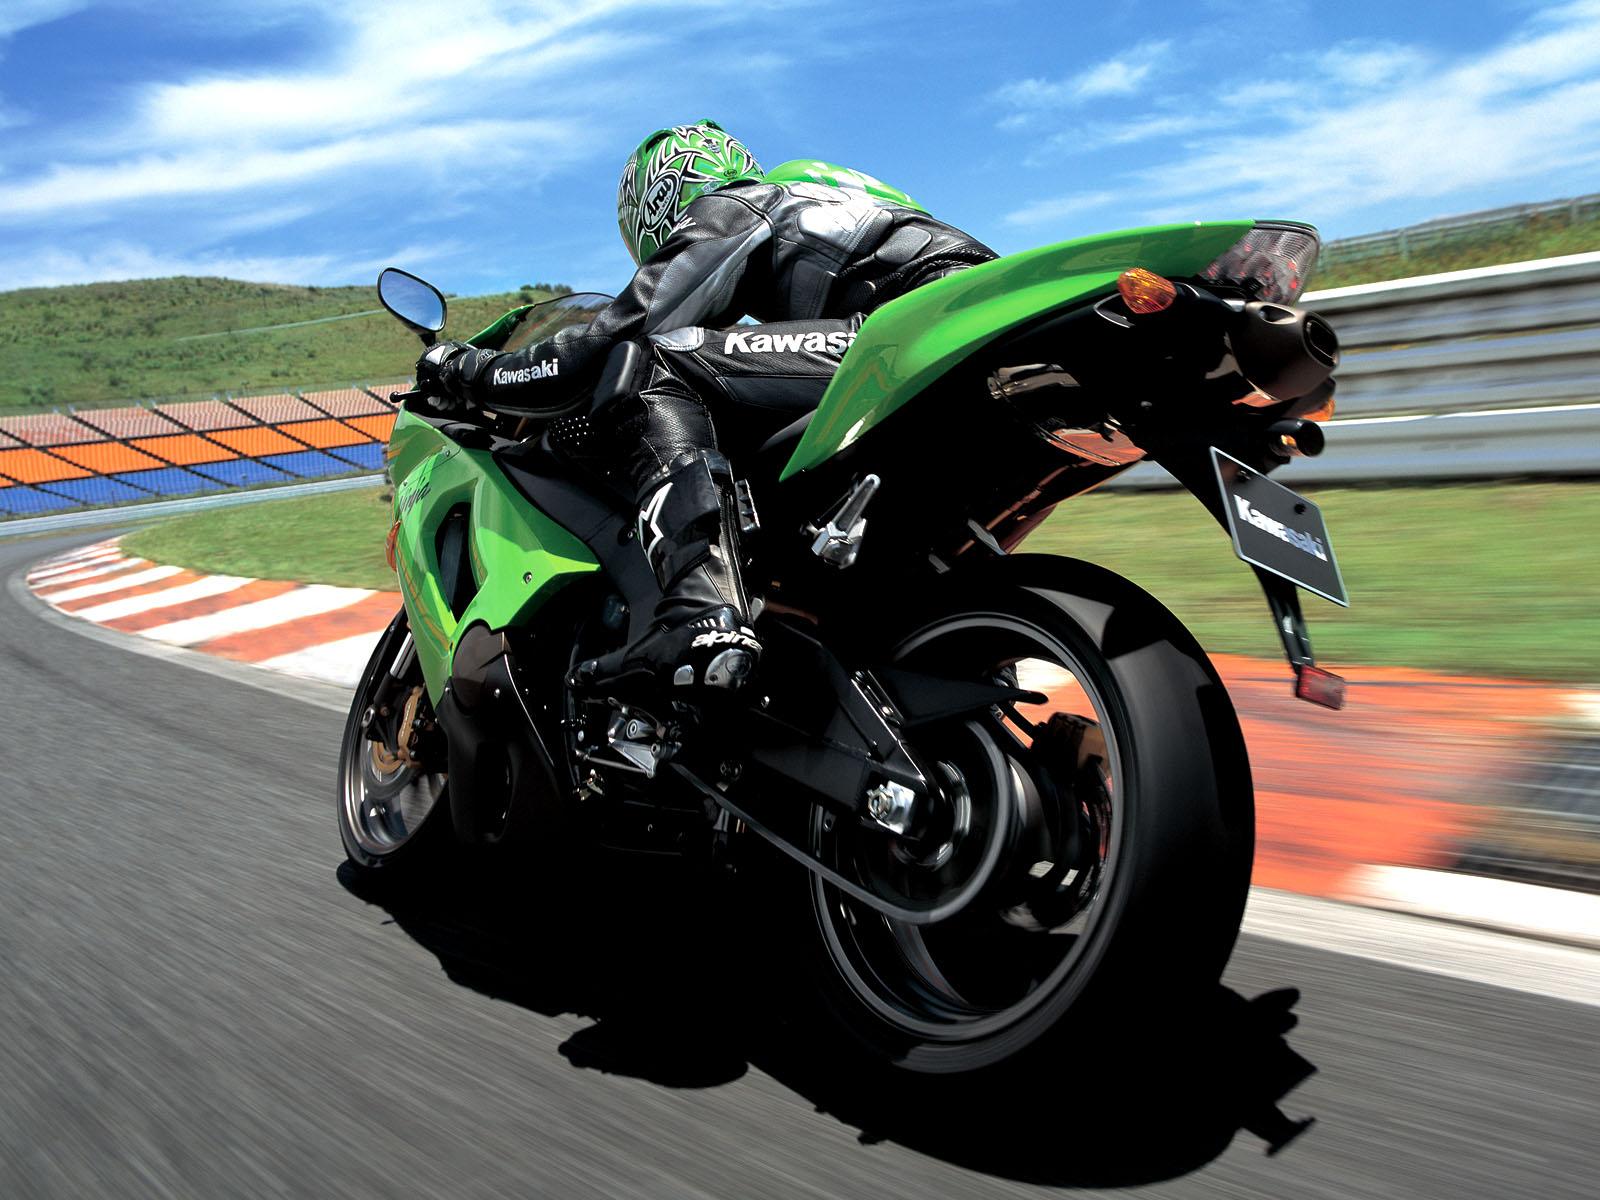 Kawasaki Ninja Rx Bike Wallpaper For Free